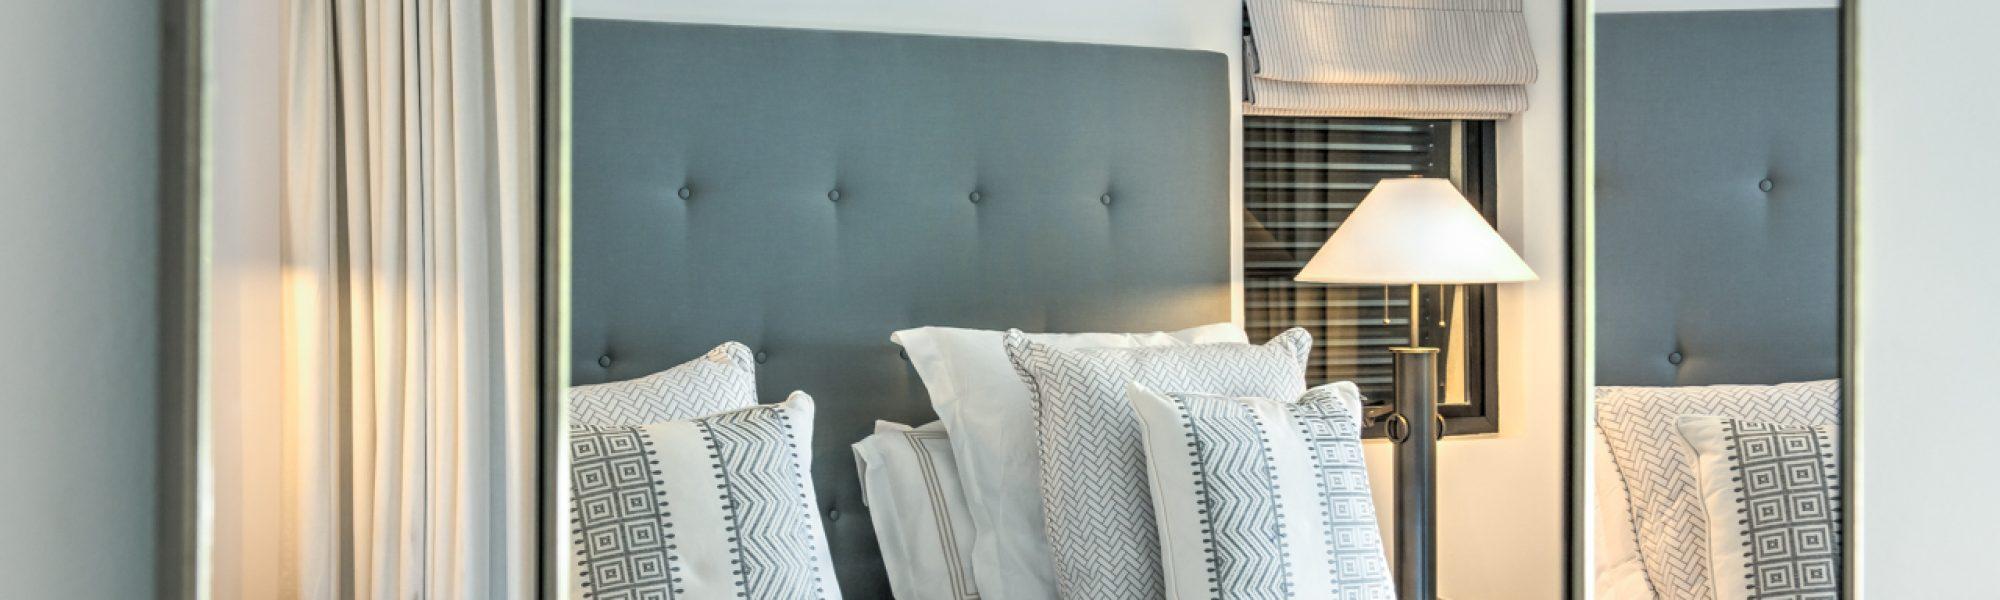 43 guestroom details A low res